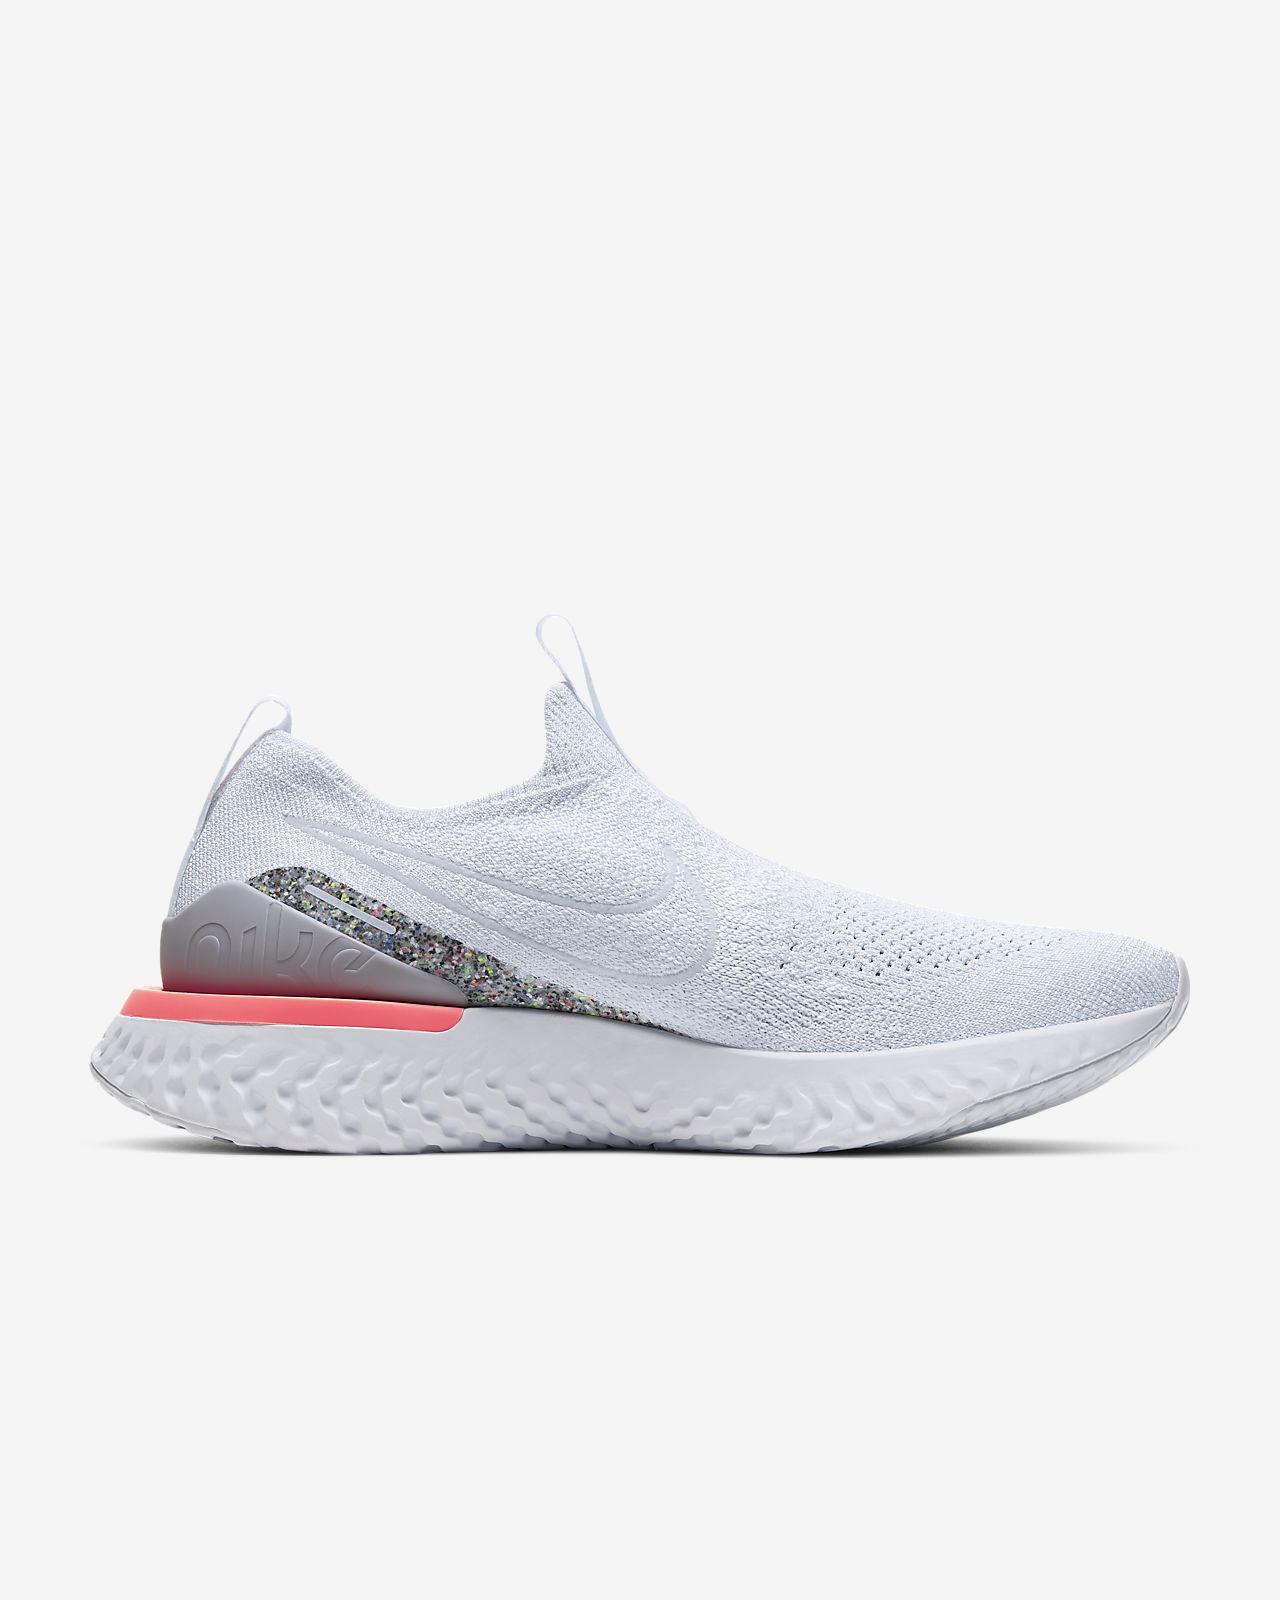 Sapatilhas de running Nike Epic Phantom React Flyknit Icon Clash para mulher